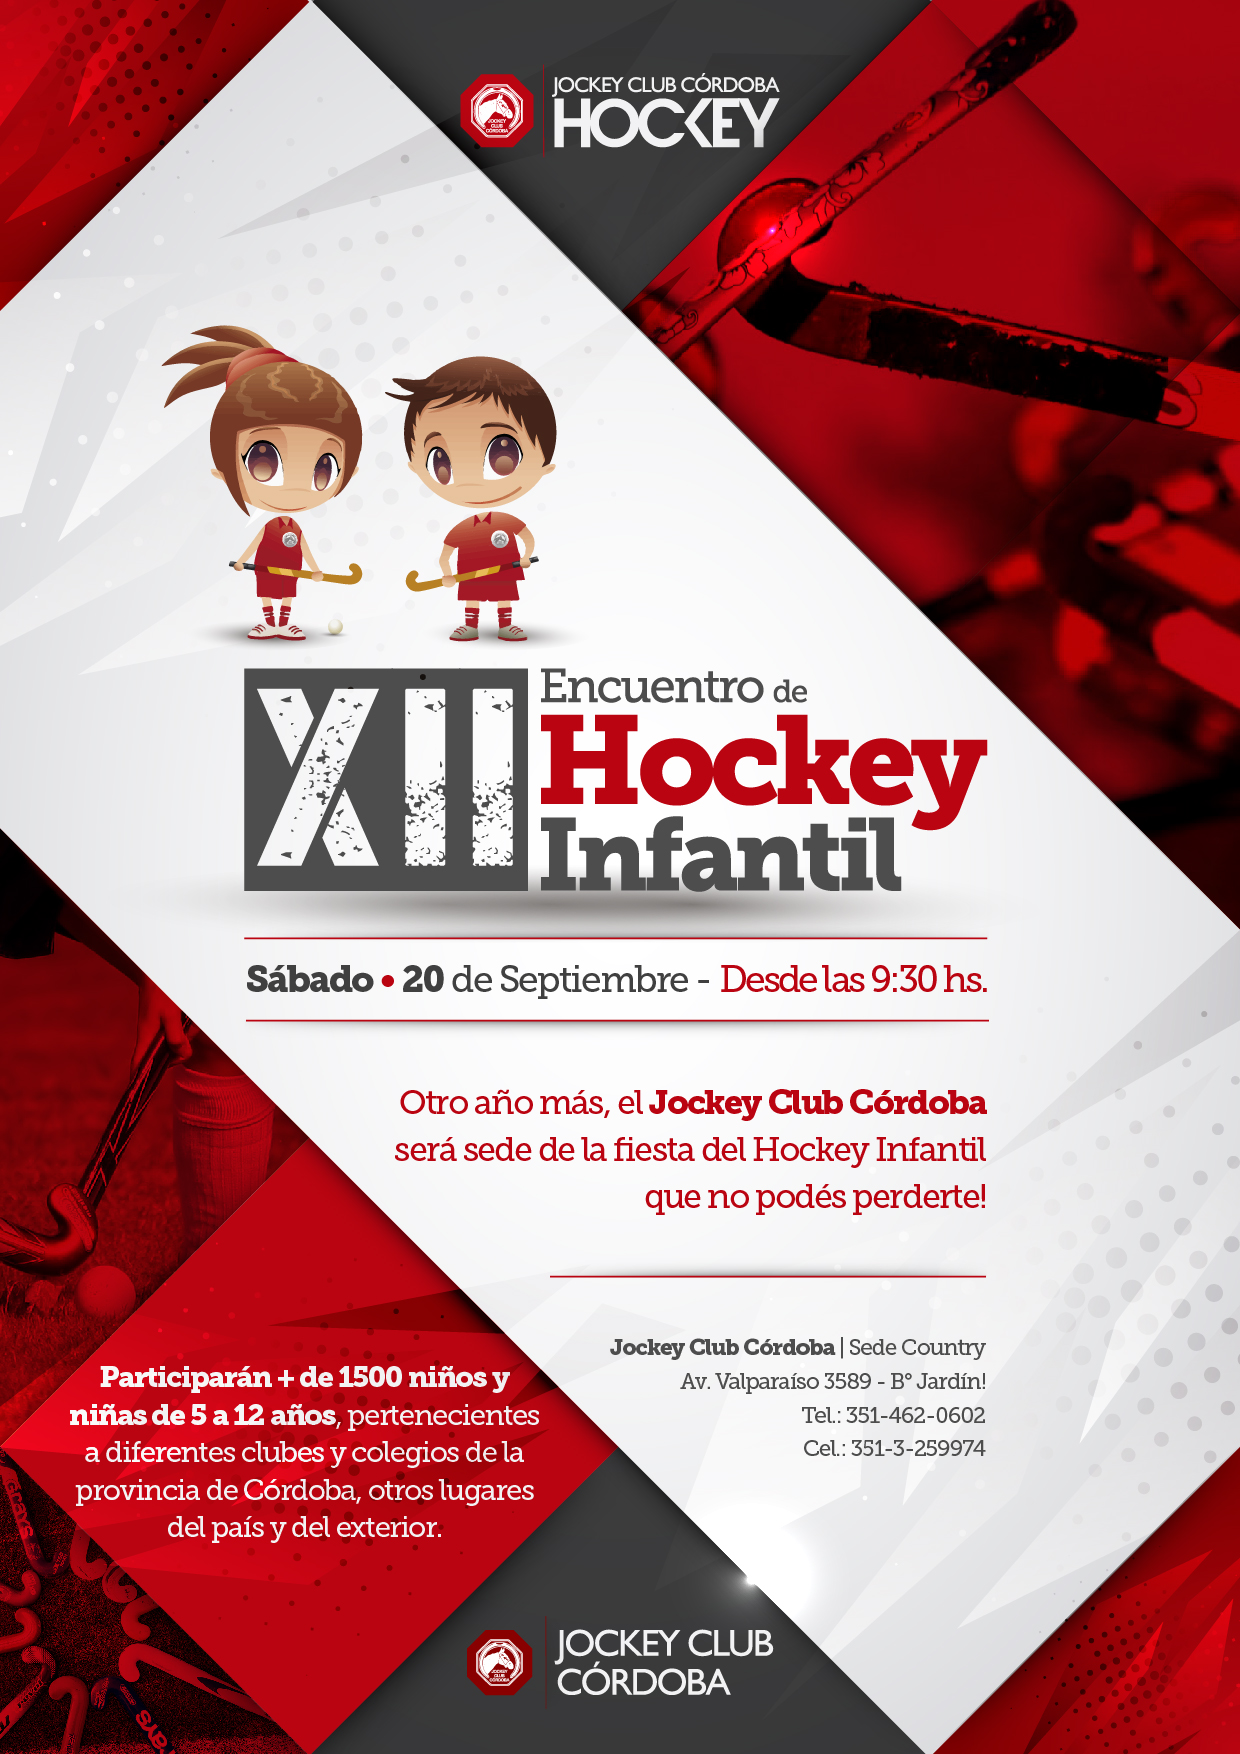 12 Encuentro de Hockey Intantil - JCC Hockey